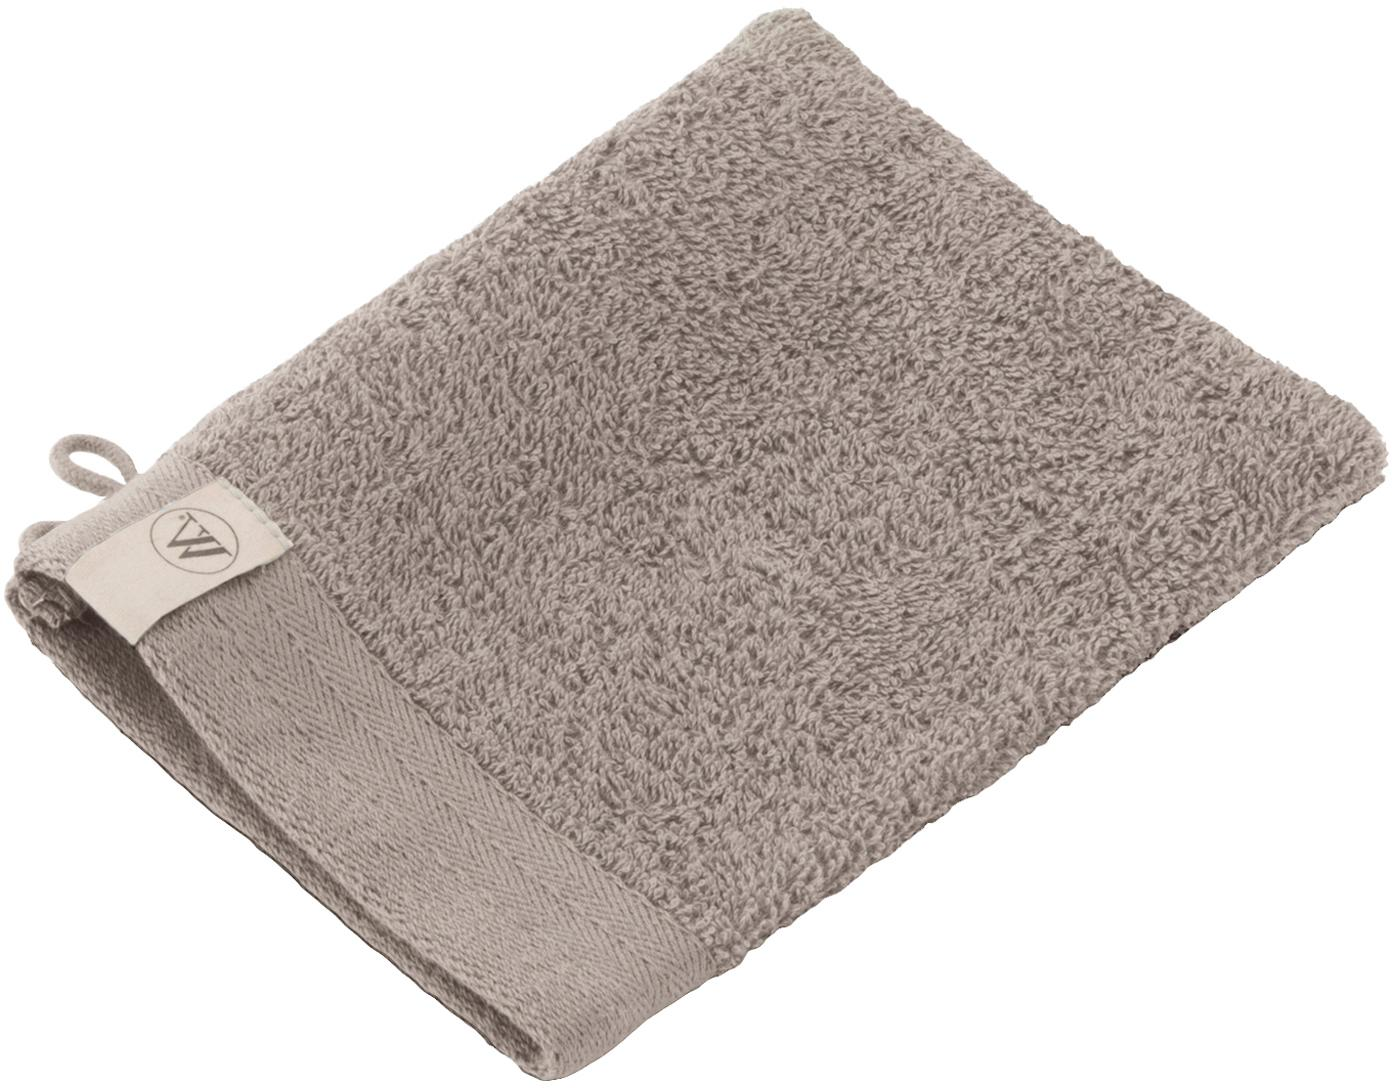 Washandjes Soft Cotton, 2 stuks, Katoen, middelzware kwaliteit, 550 g/m², Taupe, 16 x 21 cm